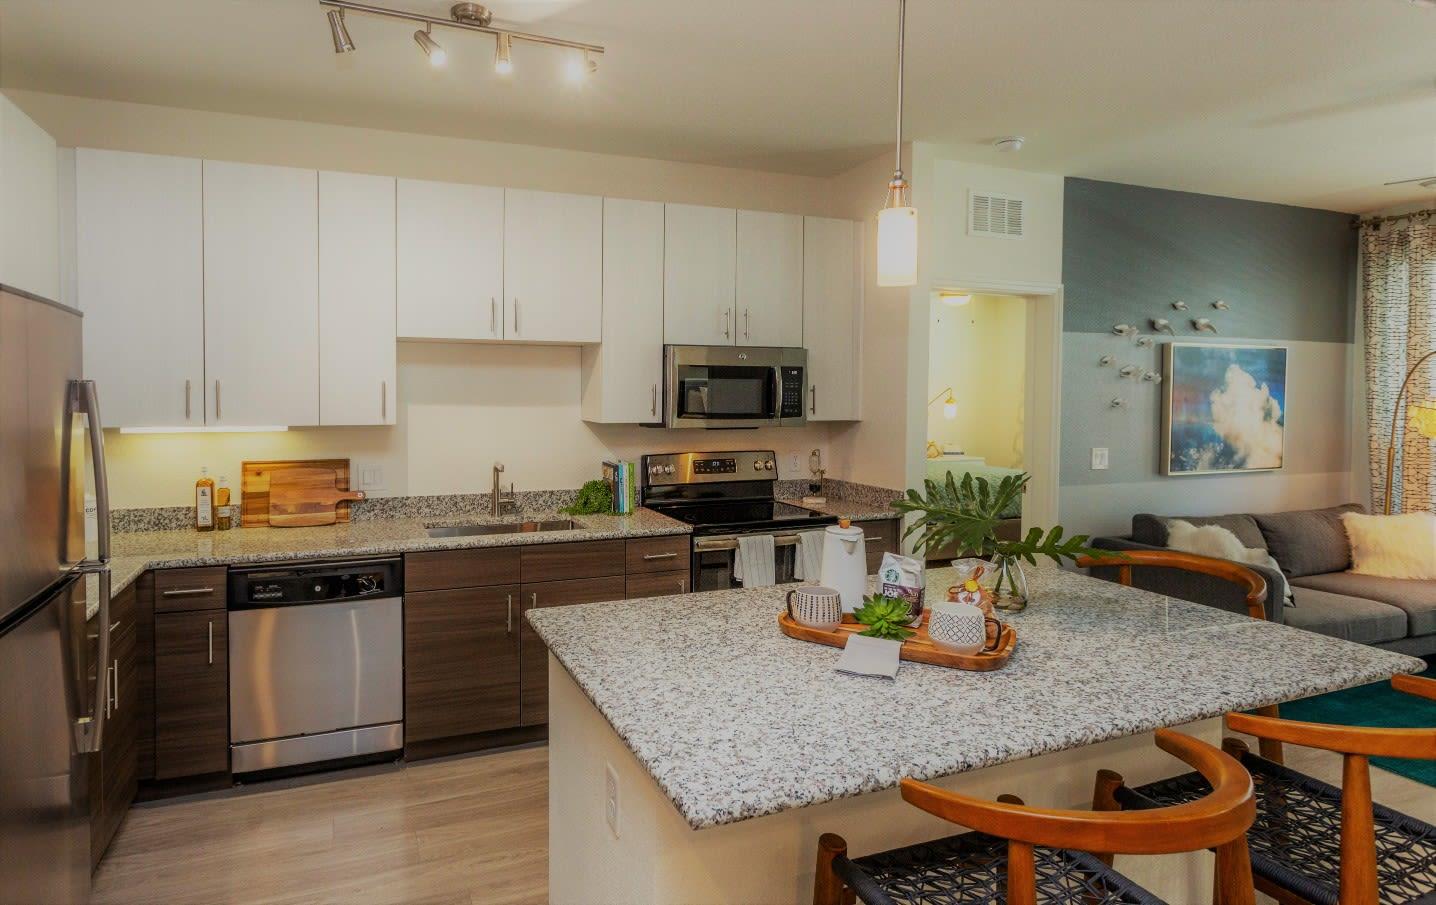 Kitchen at 50 Paramount Apartments in Tampa Florida